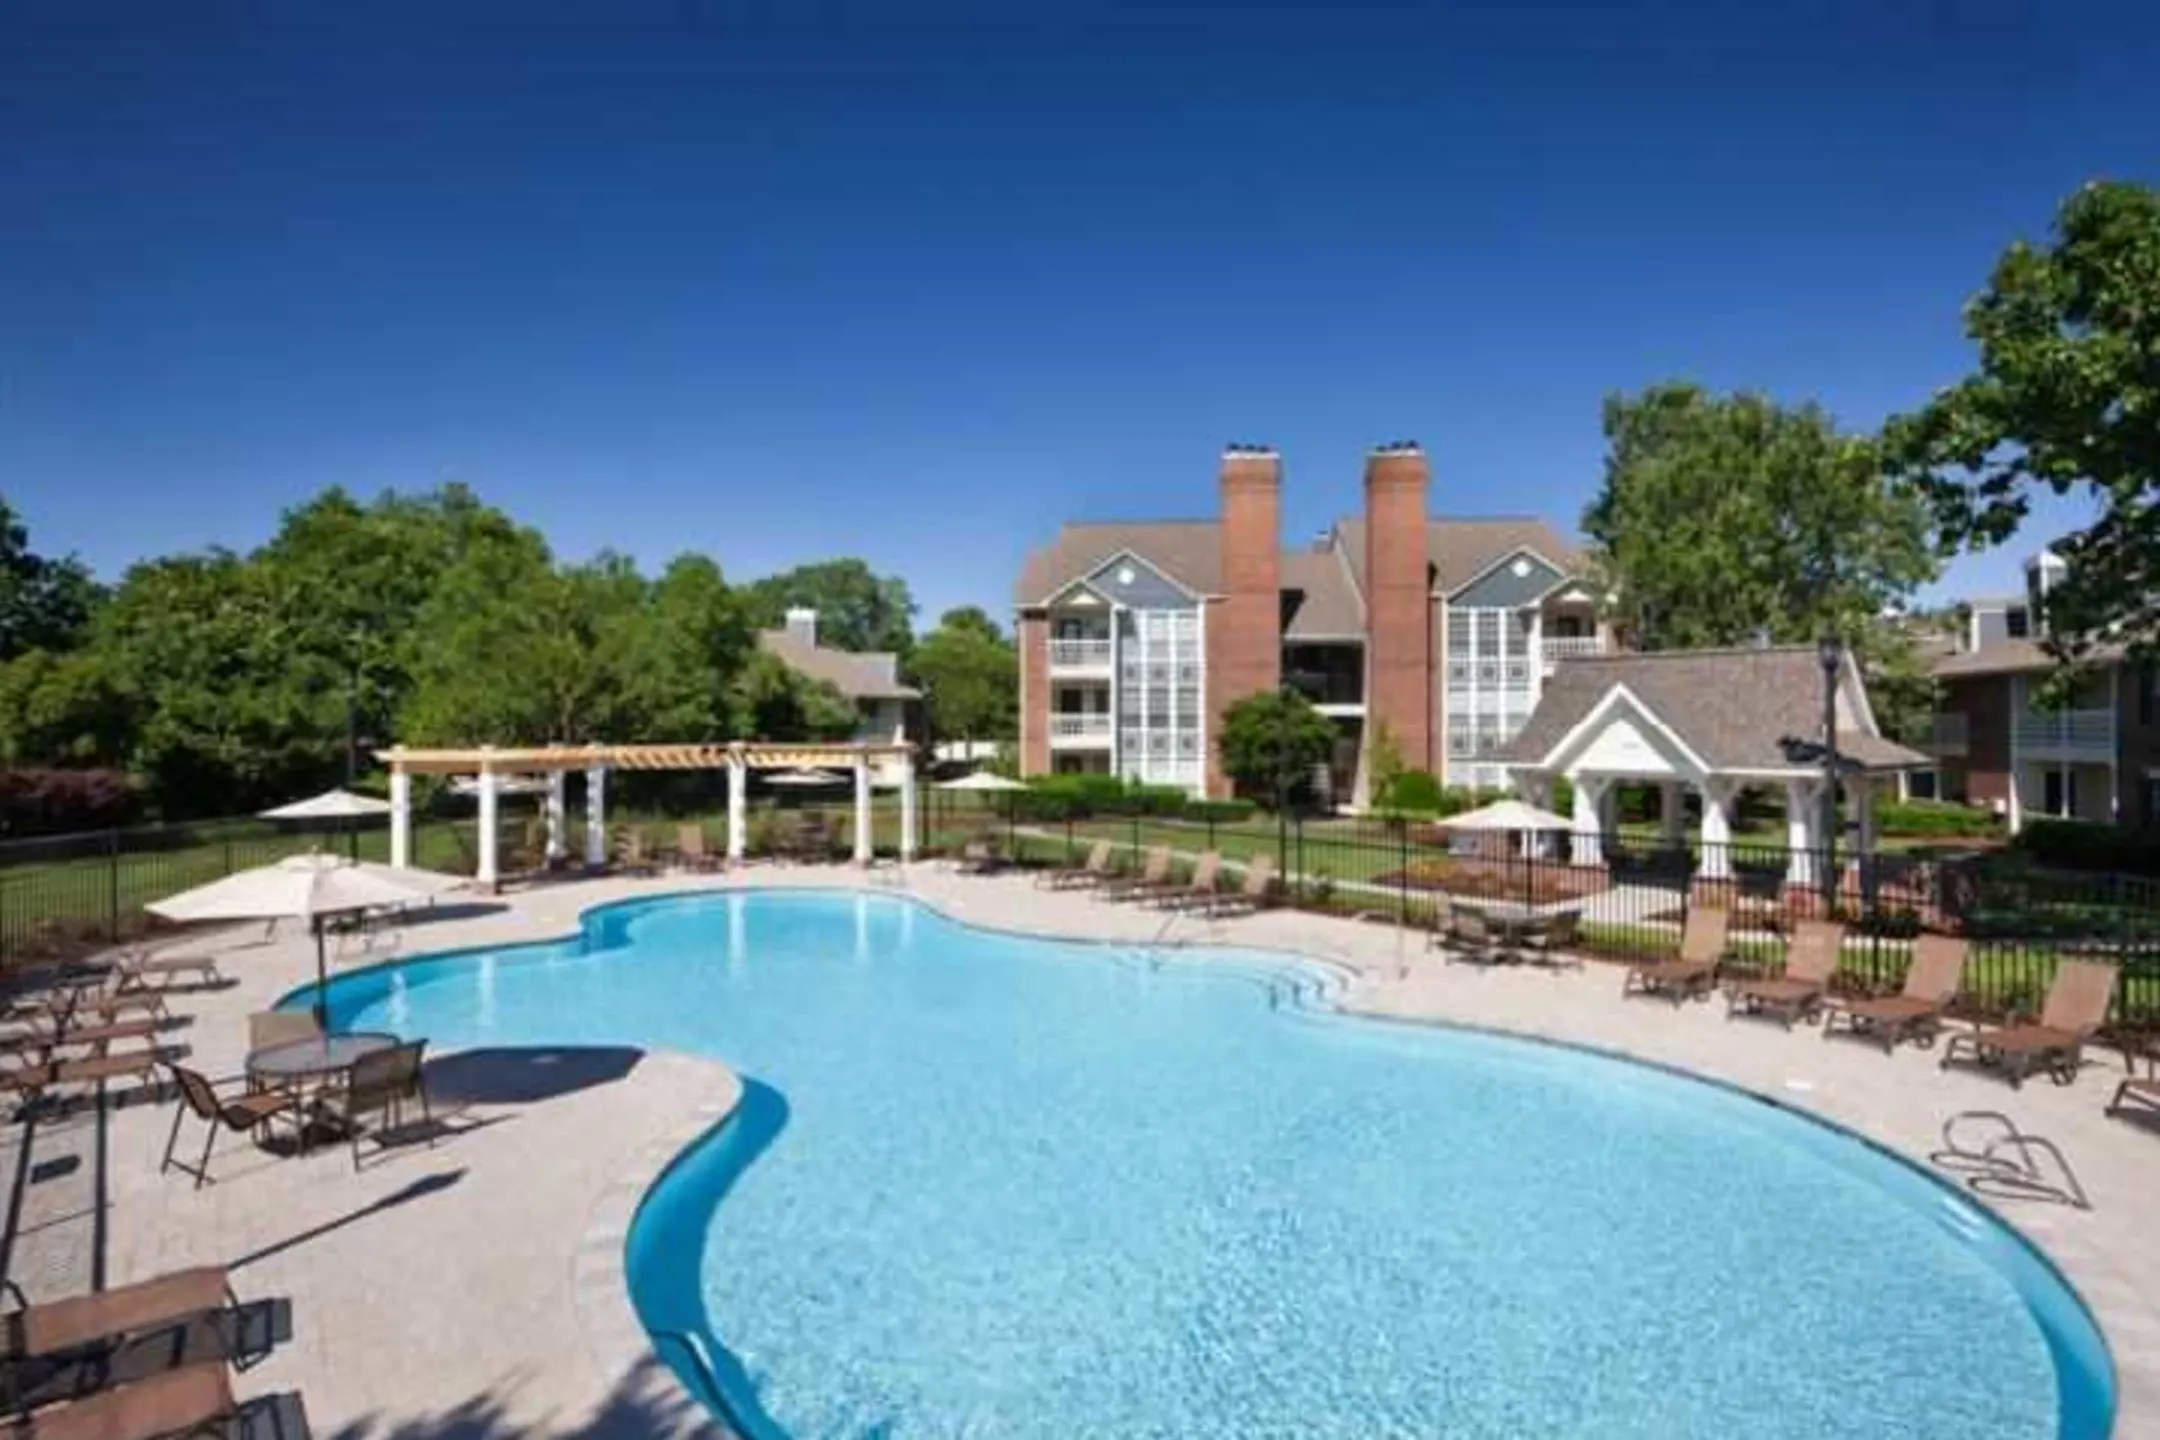 Addison At Hampton Apartments  Hampton VA 23666